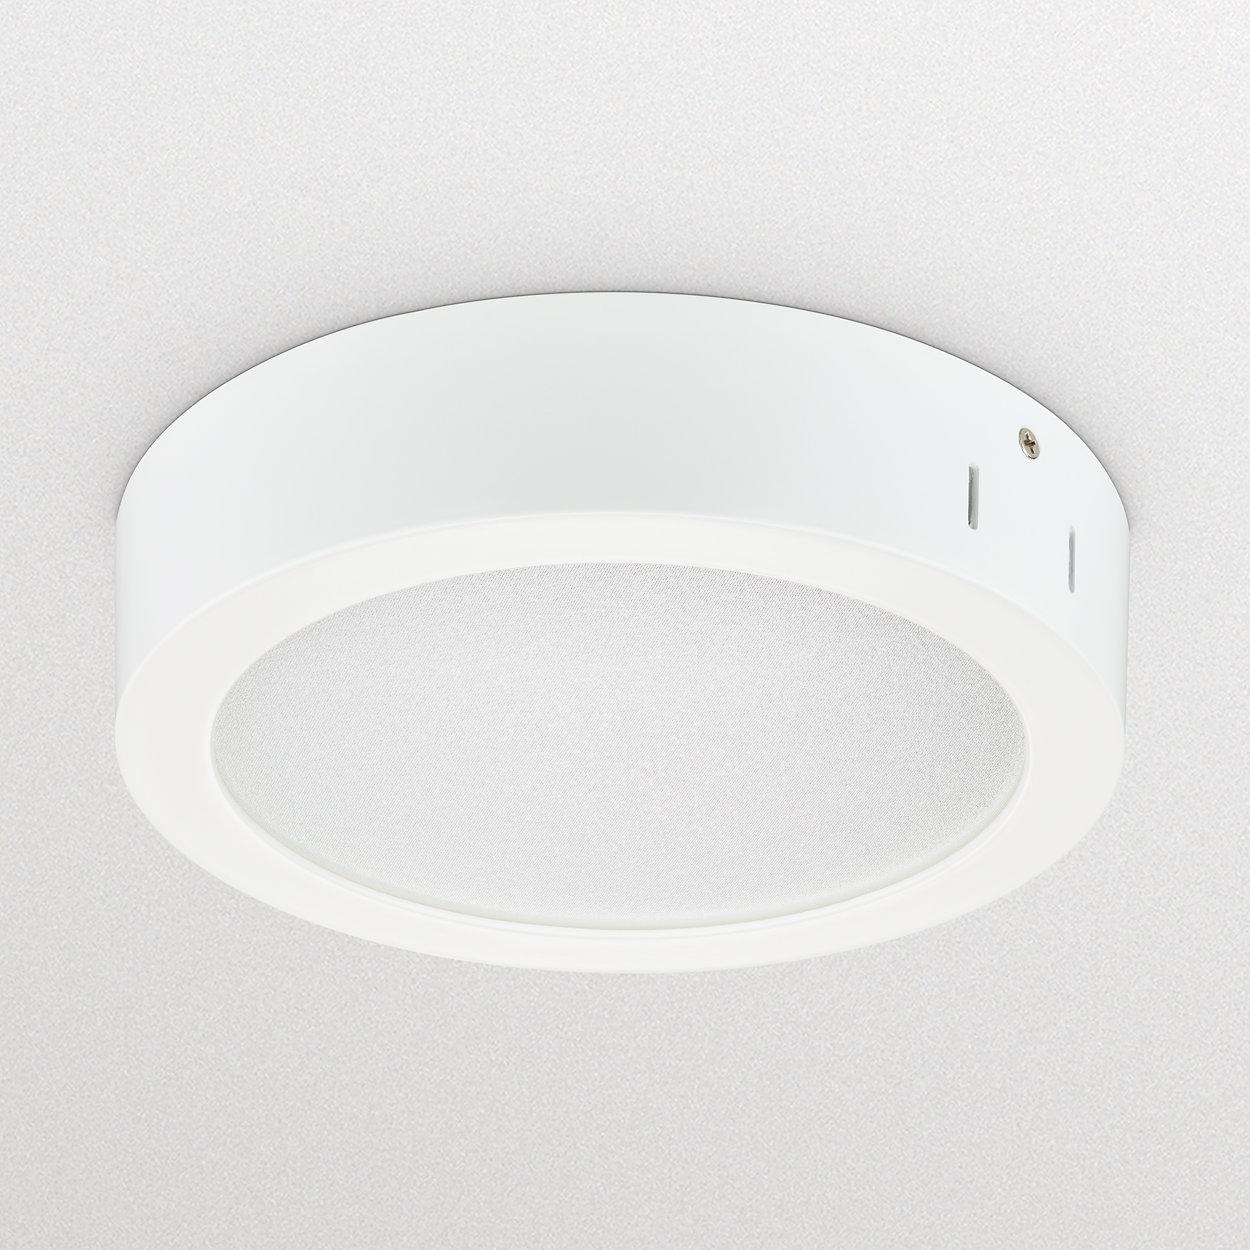 CoreLine SlimDownlight - για κάθε εφαρμογή, όπου ο φωτισμός είναι πραγματικά σημαντικός